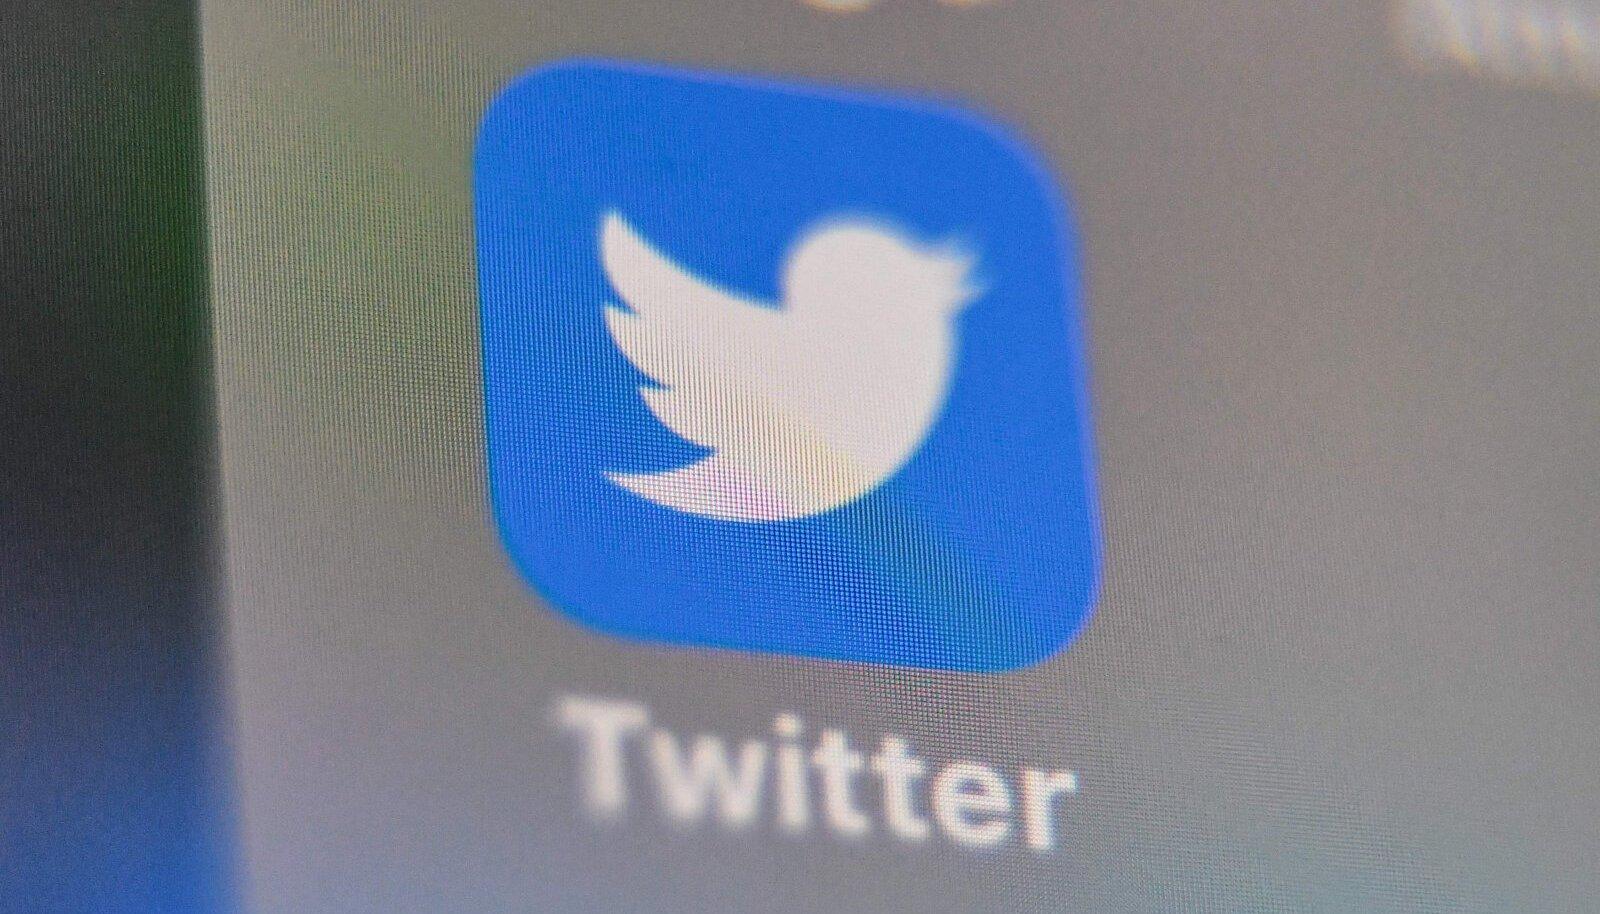 Twitteri logo